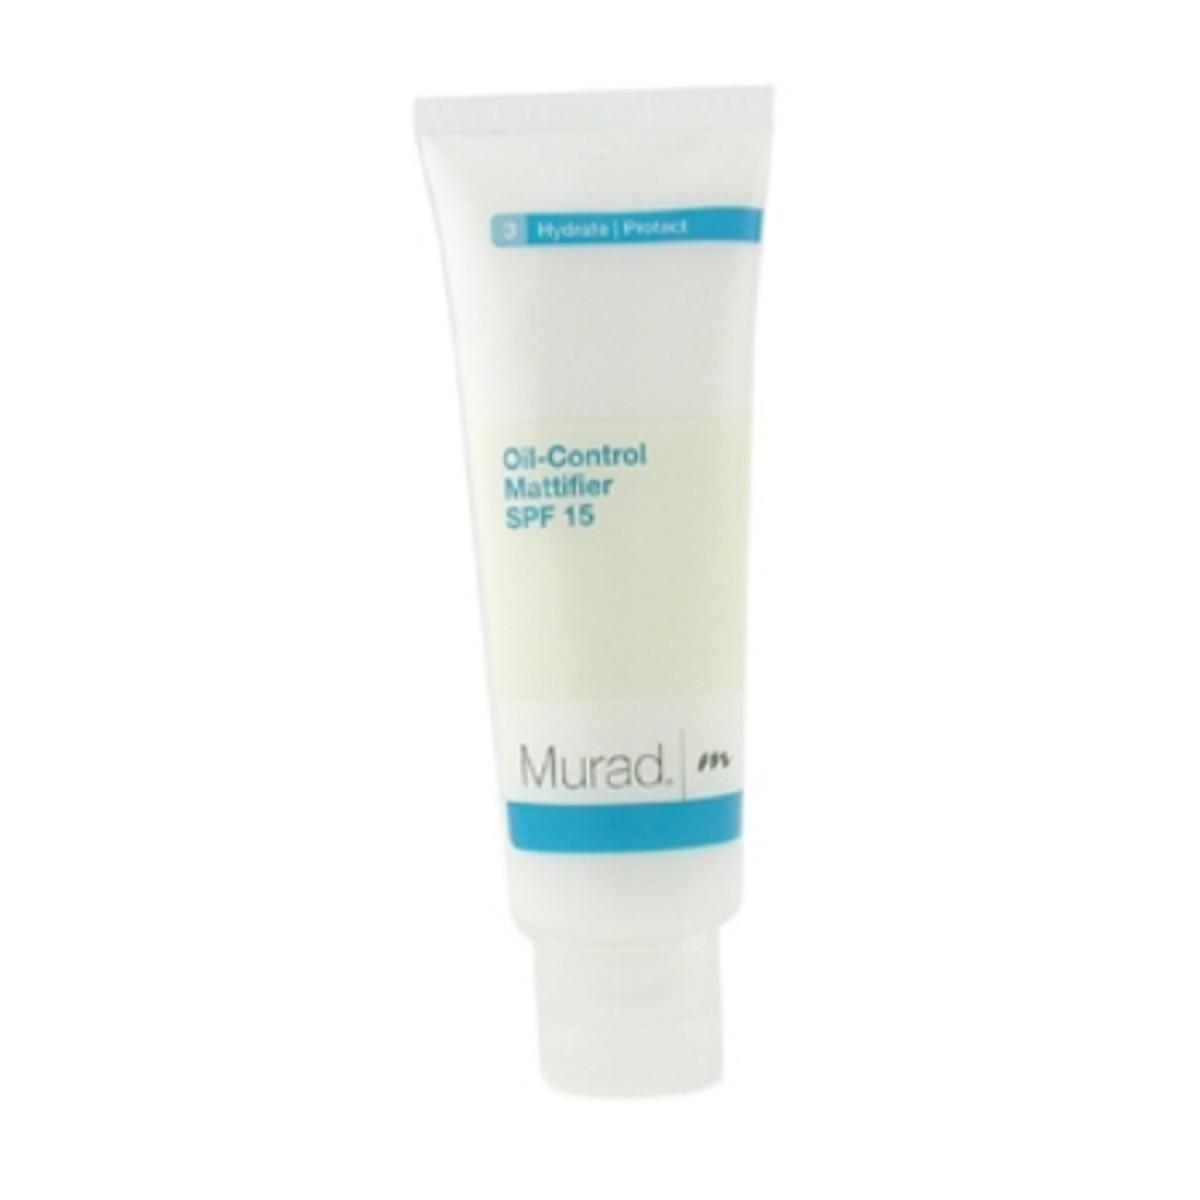 Murad-Oil-Control-Mattifier-SPF-15